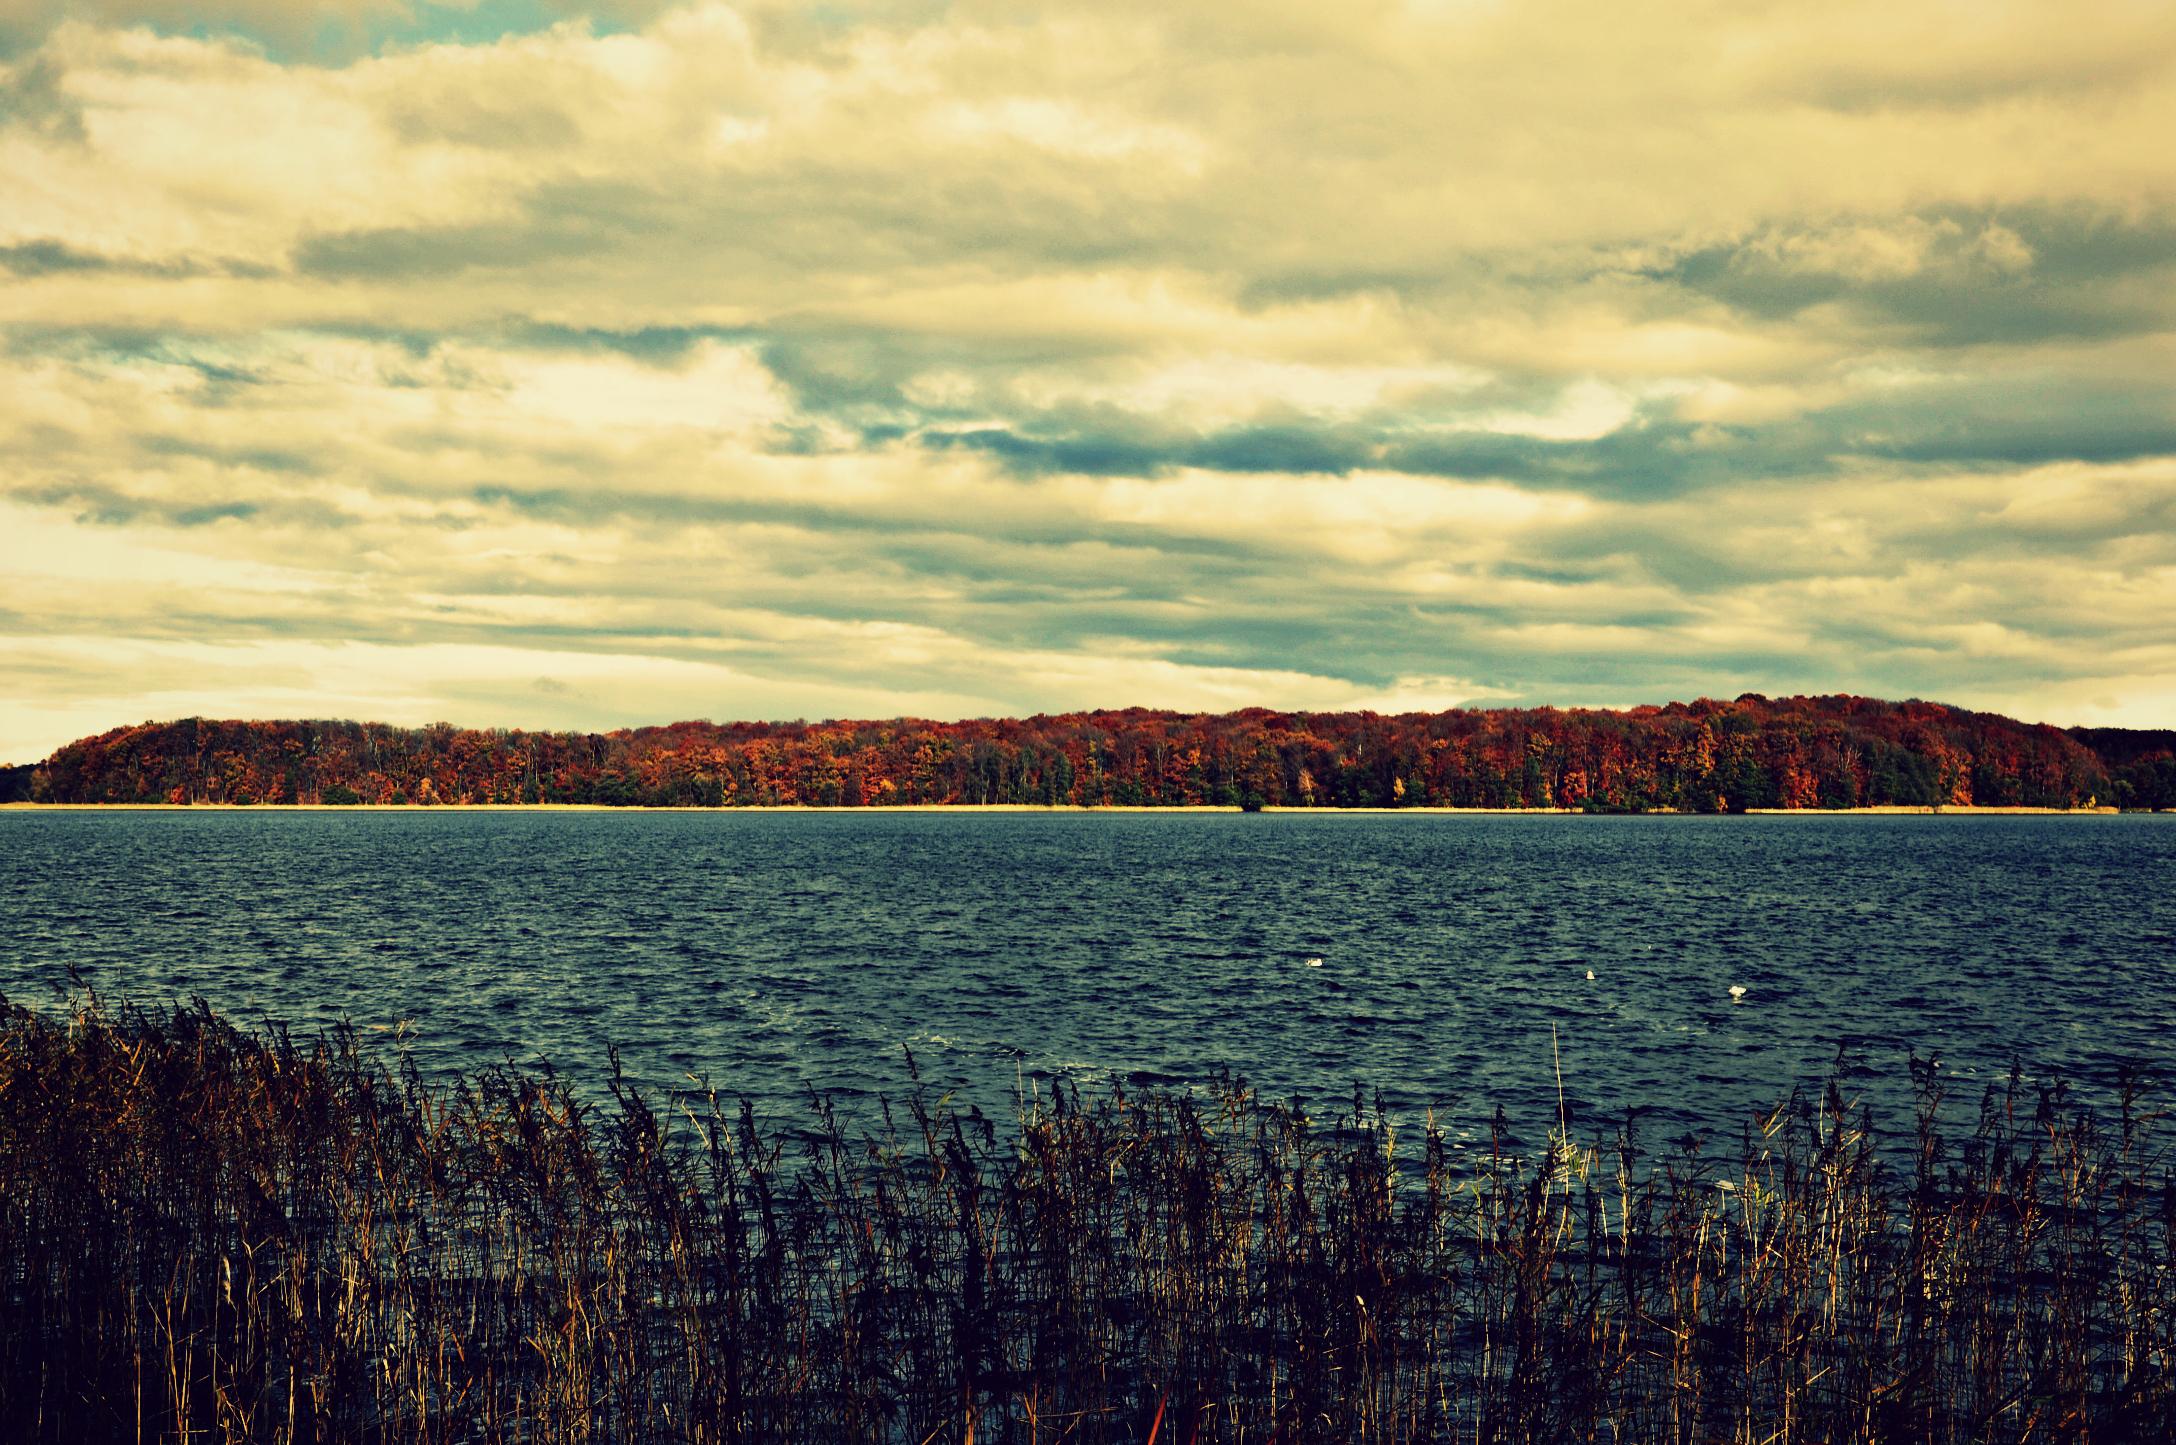 Autumn 3 by M1C3k